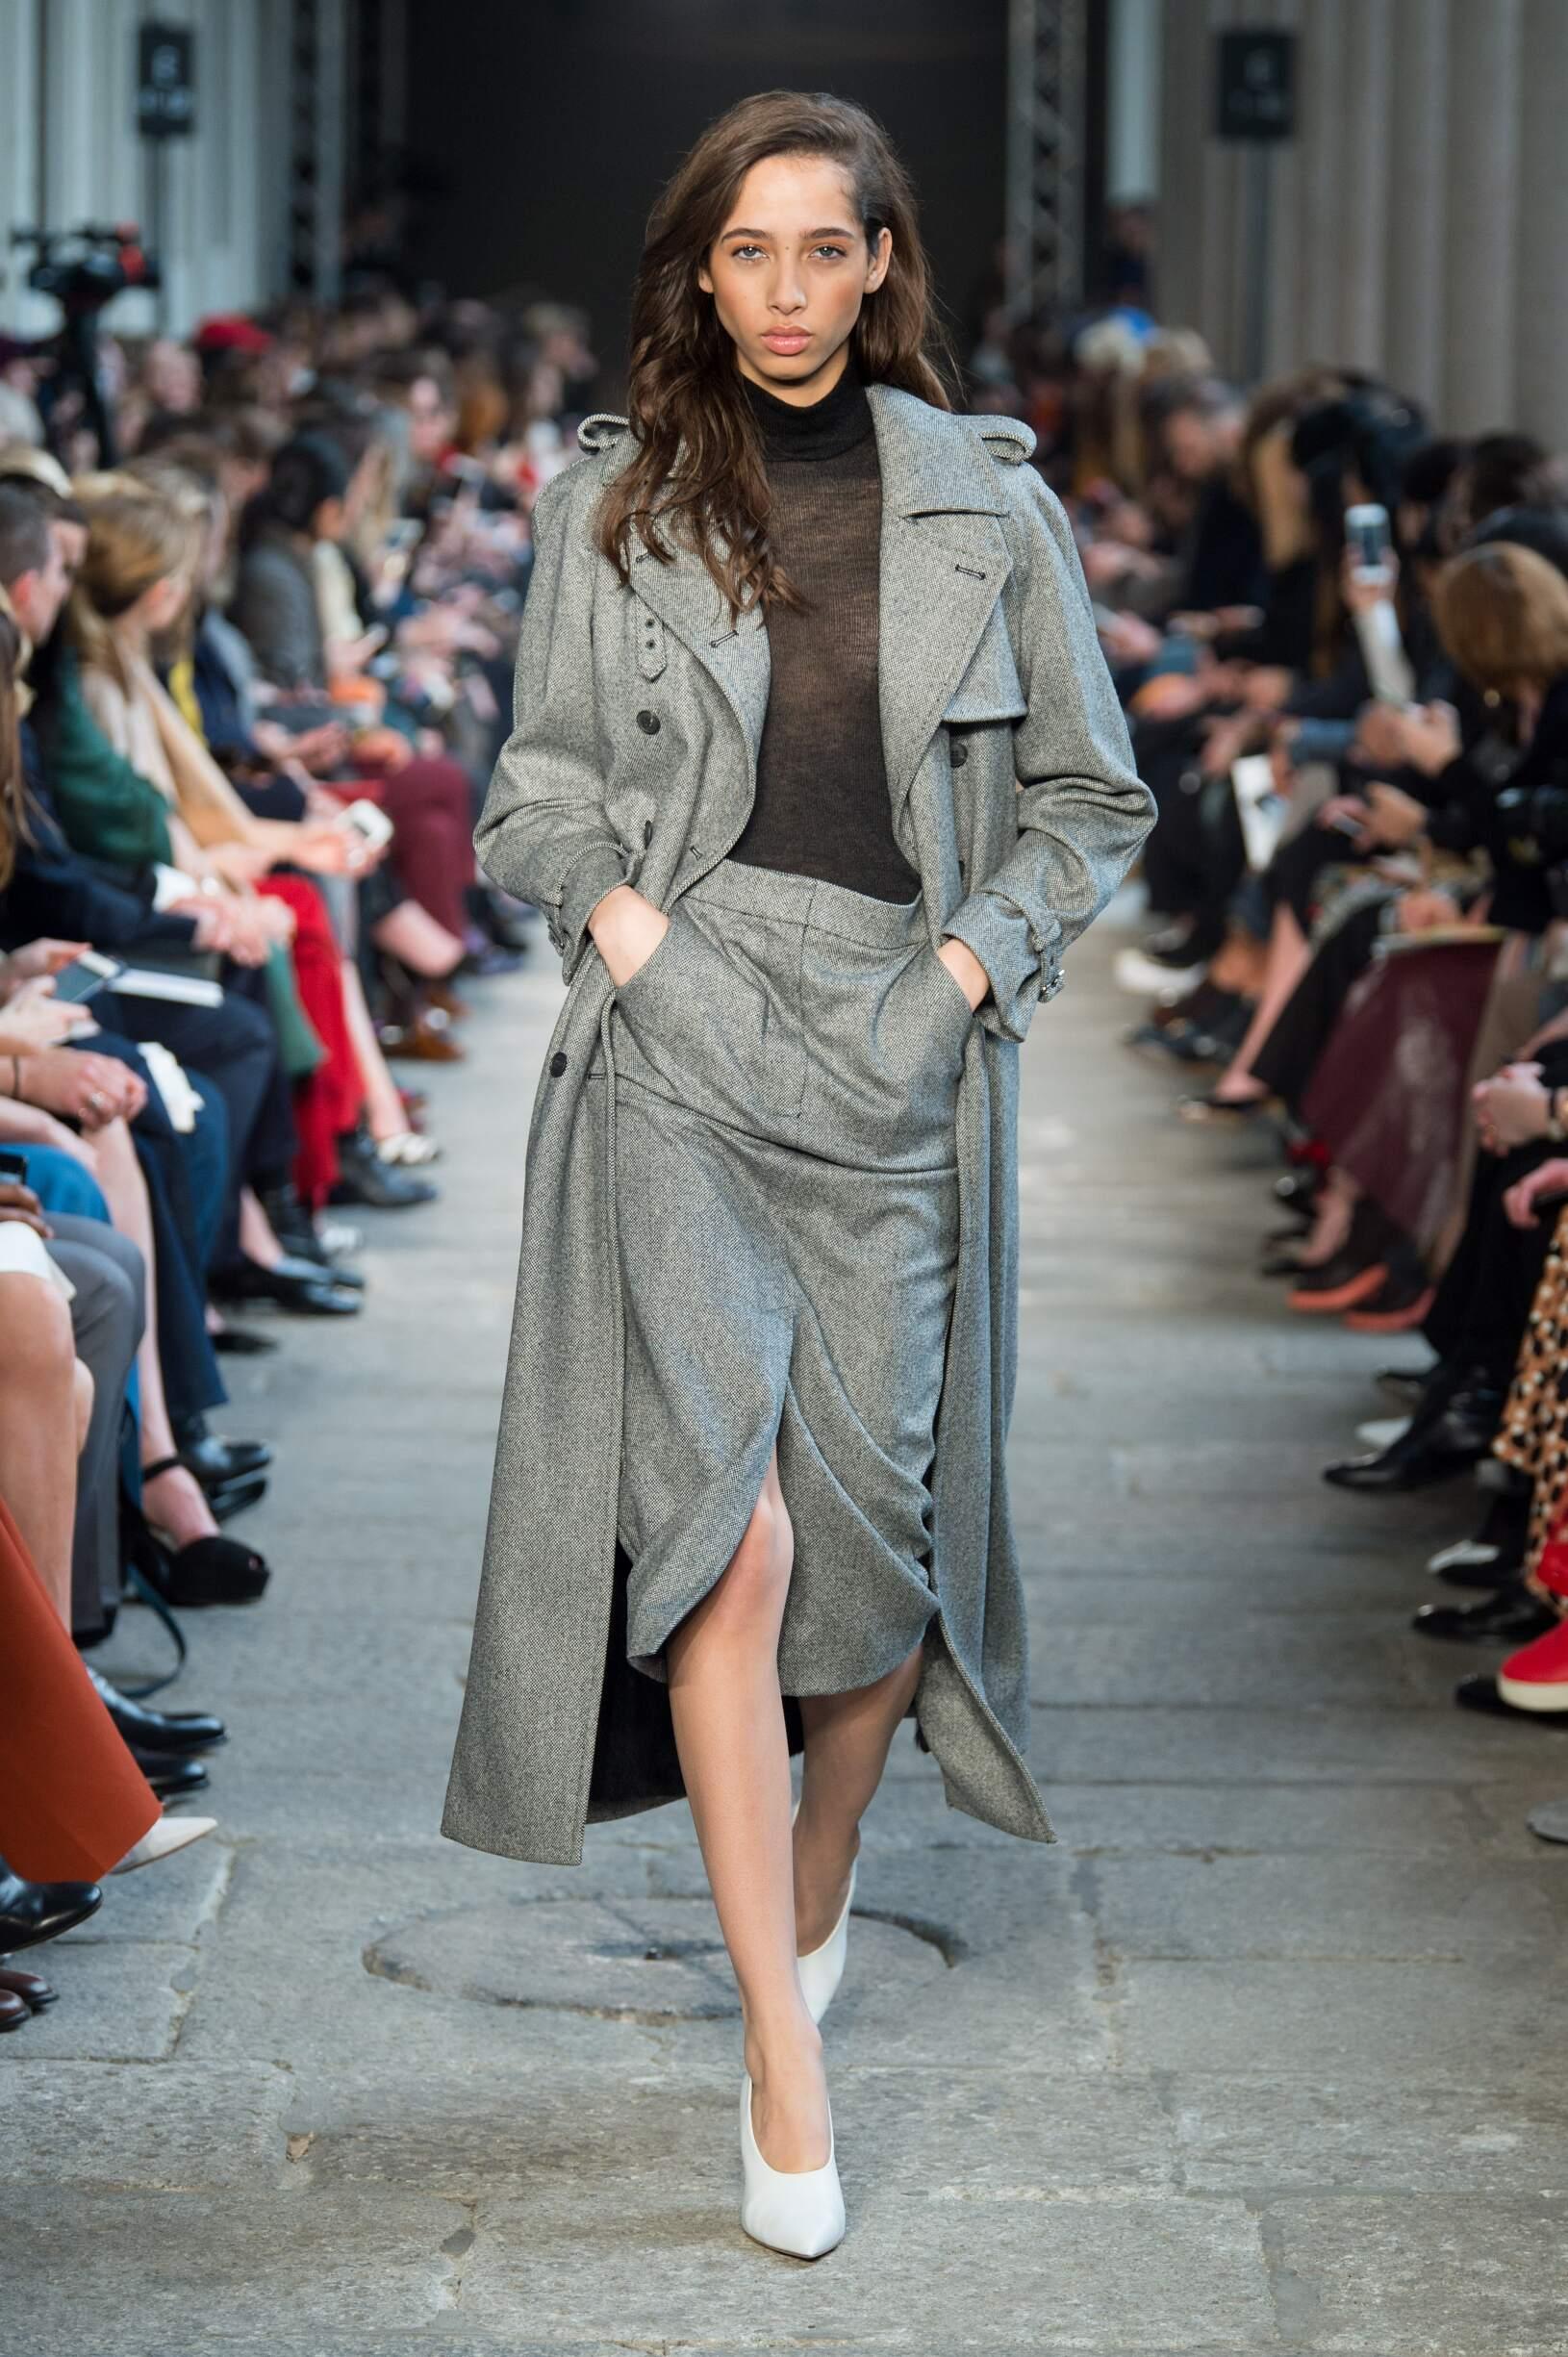 Max Mara FW 2017 Womenswear